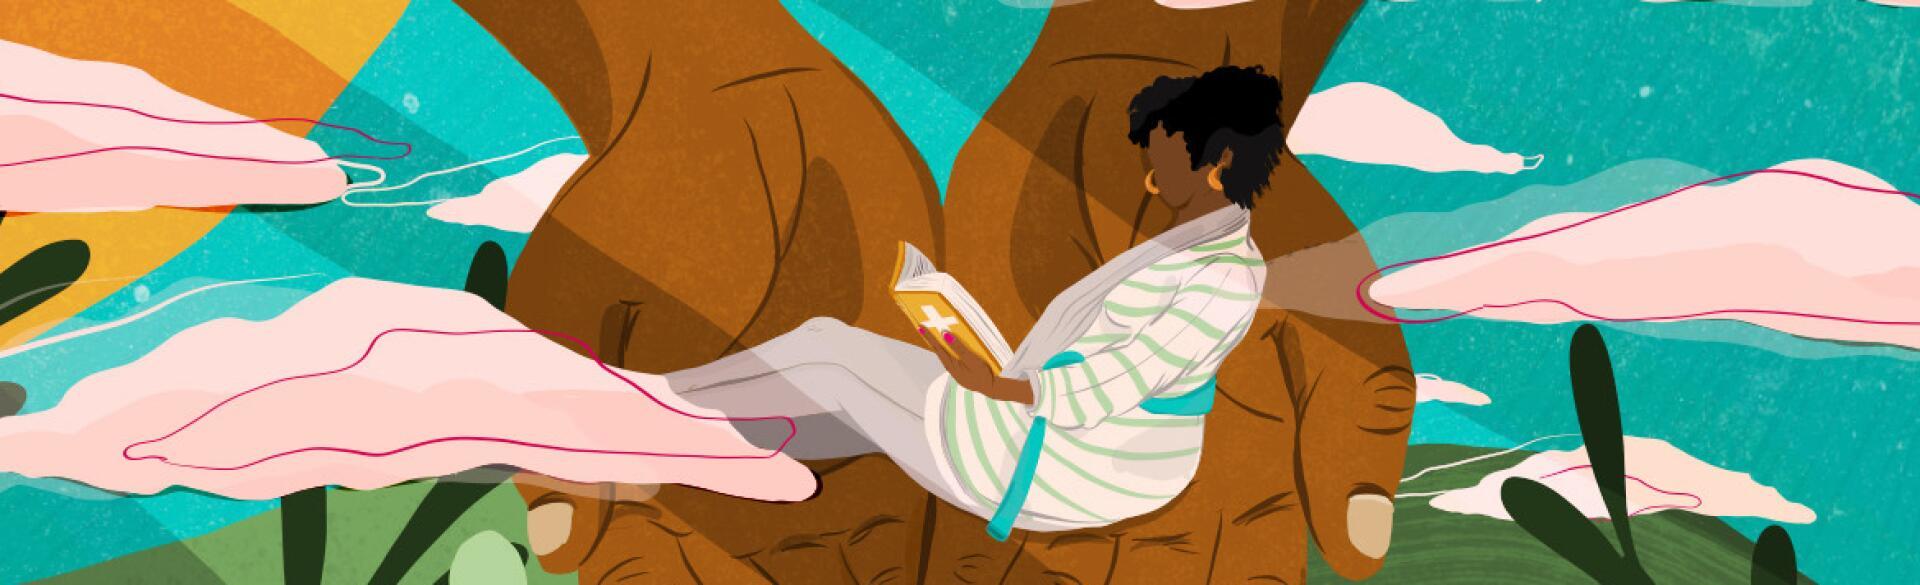 illustration_of_woman_reading_the_bible_resting_on_hands_faith_by_rashida_chavis_1440x584.jpg